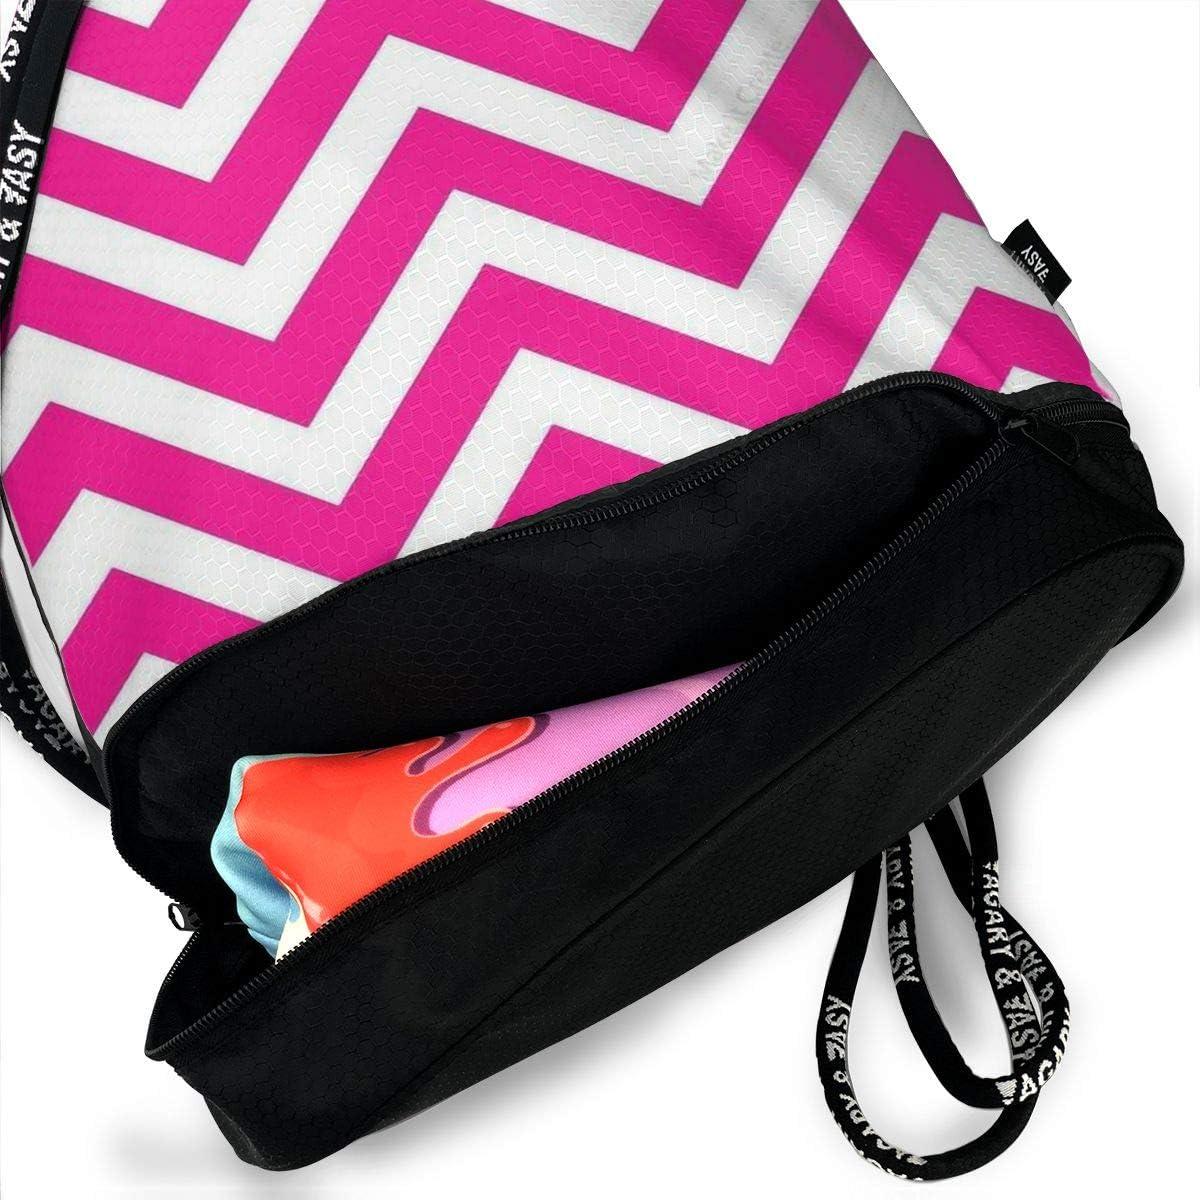 Drawstring Backpack Colorful Chevron Gym Bag